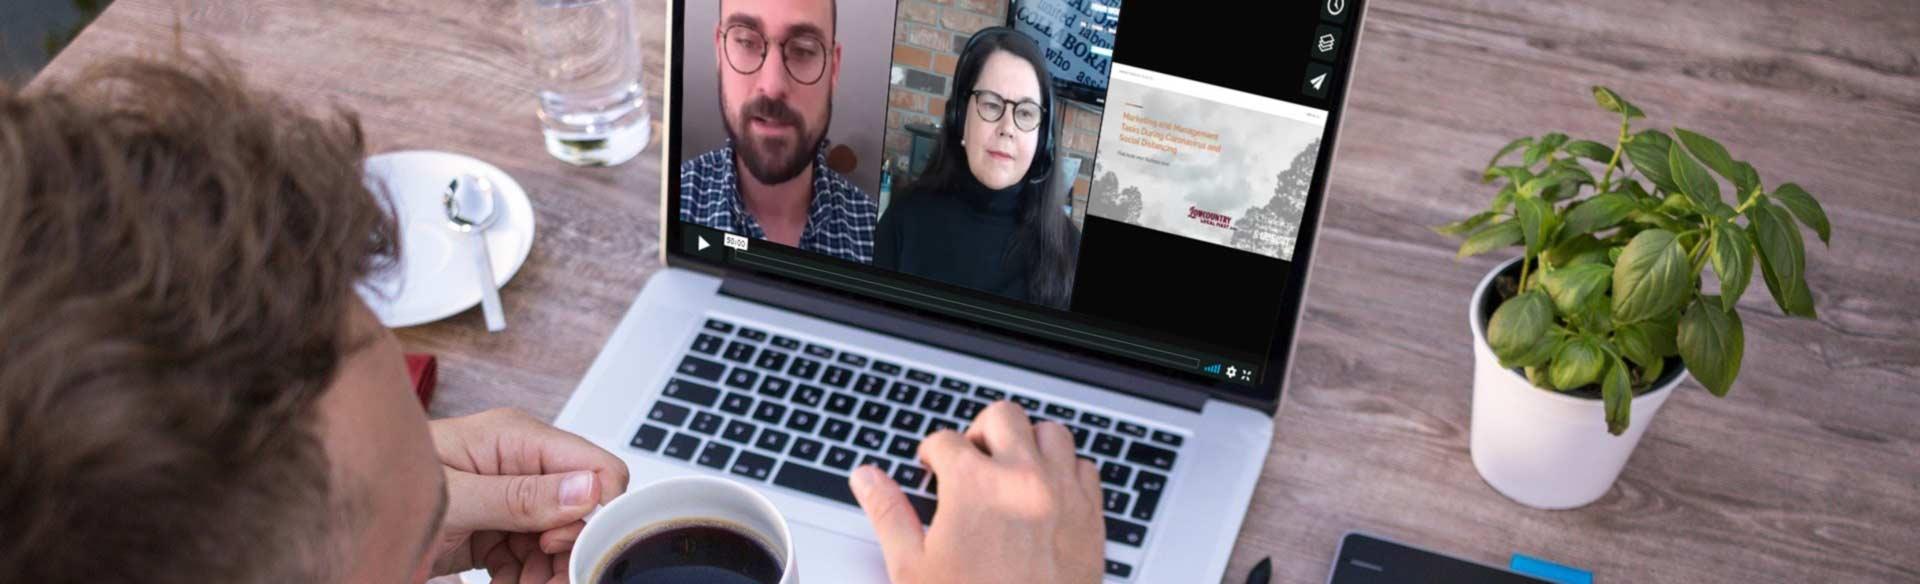 webinar marketing tasks during coronavirus